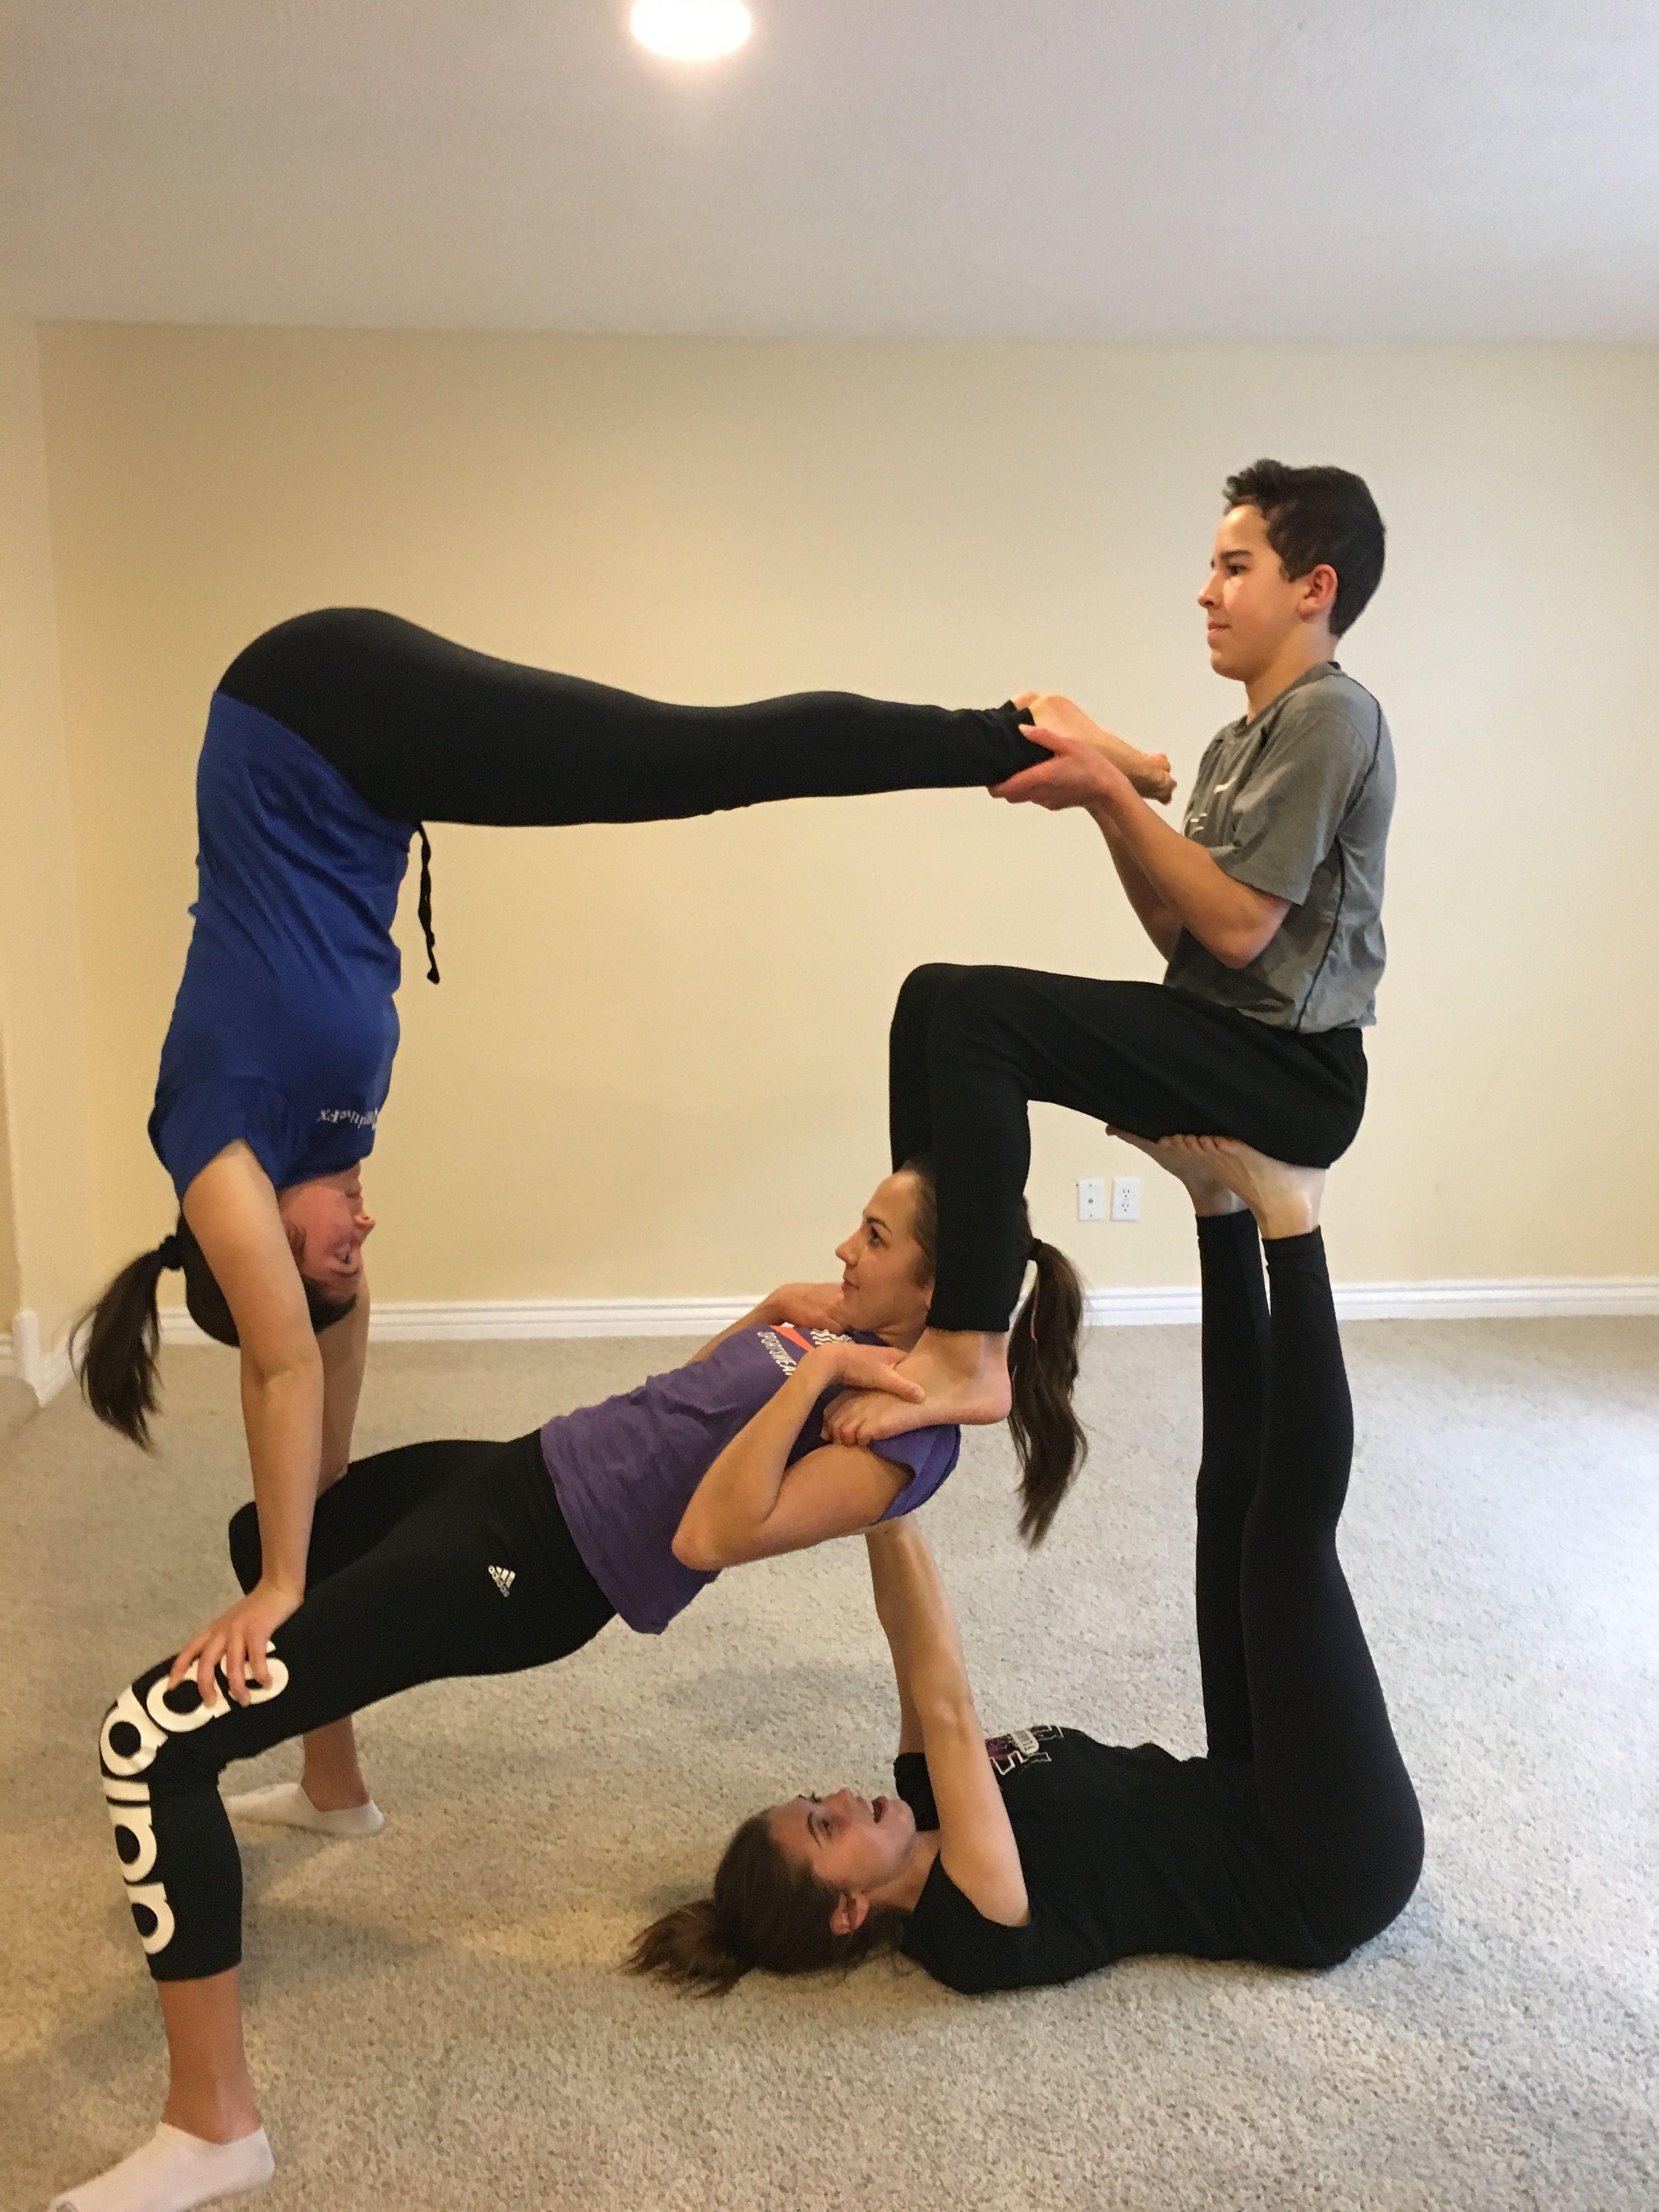 Pin By Azhurekampen On Yoga Partner Yoga Poses Partner Yoga Acro Yoga Poses